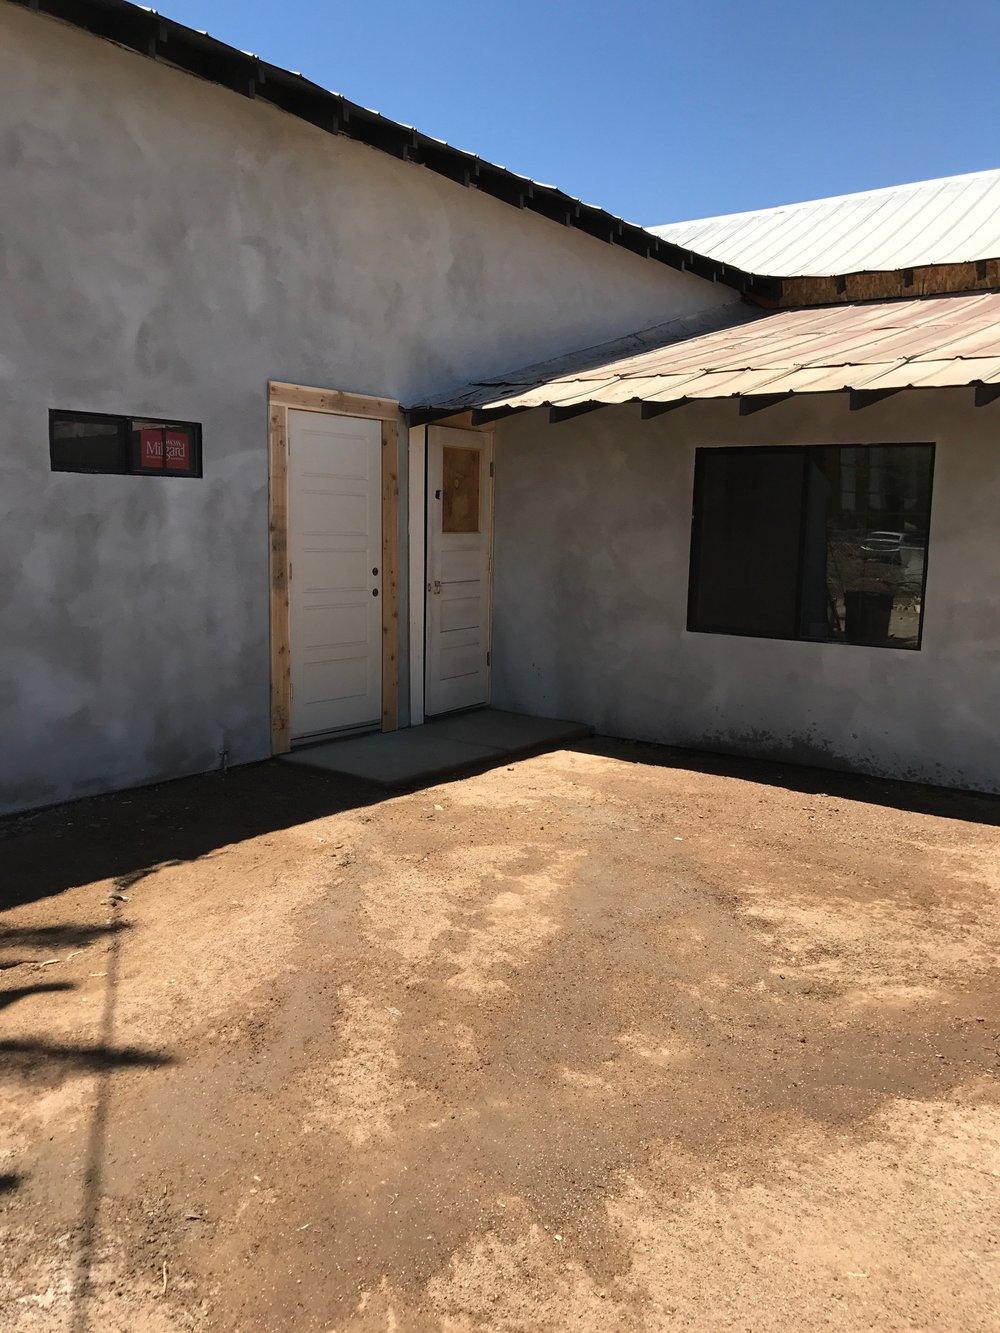 Rowhouse25 - Tremaine Ranch - Air BNB Rental - Phoenix, Arizona18.JPG